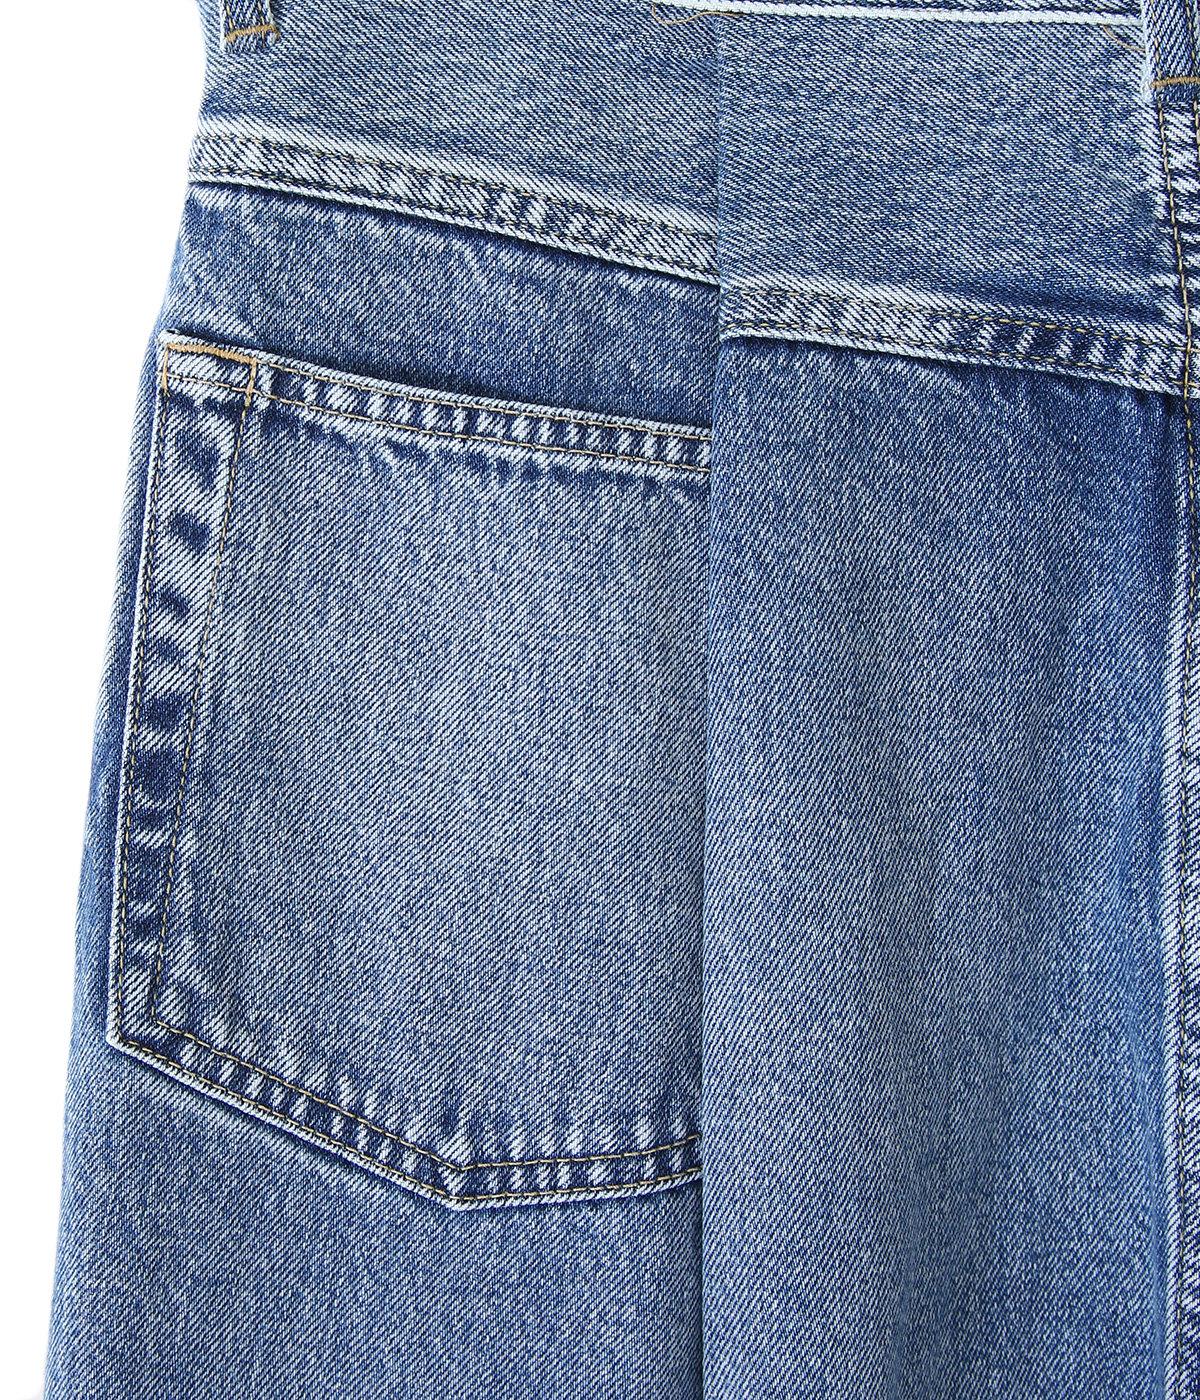 COTTON DENIM / TUCK PANTS - indigo -